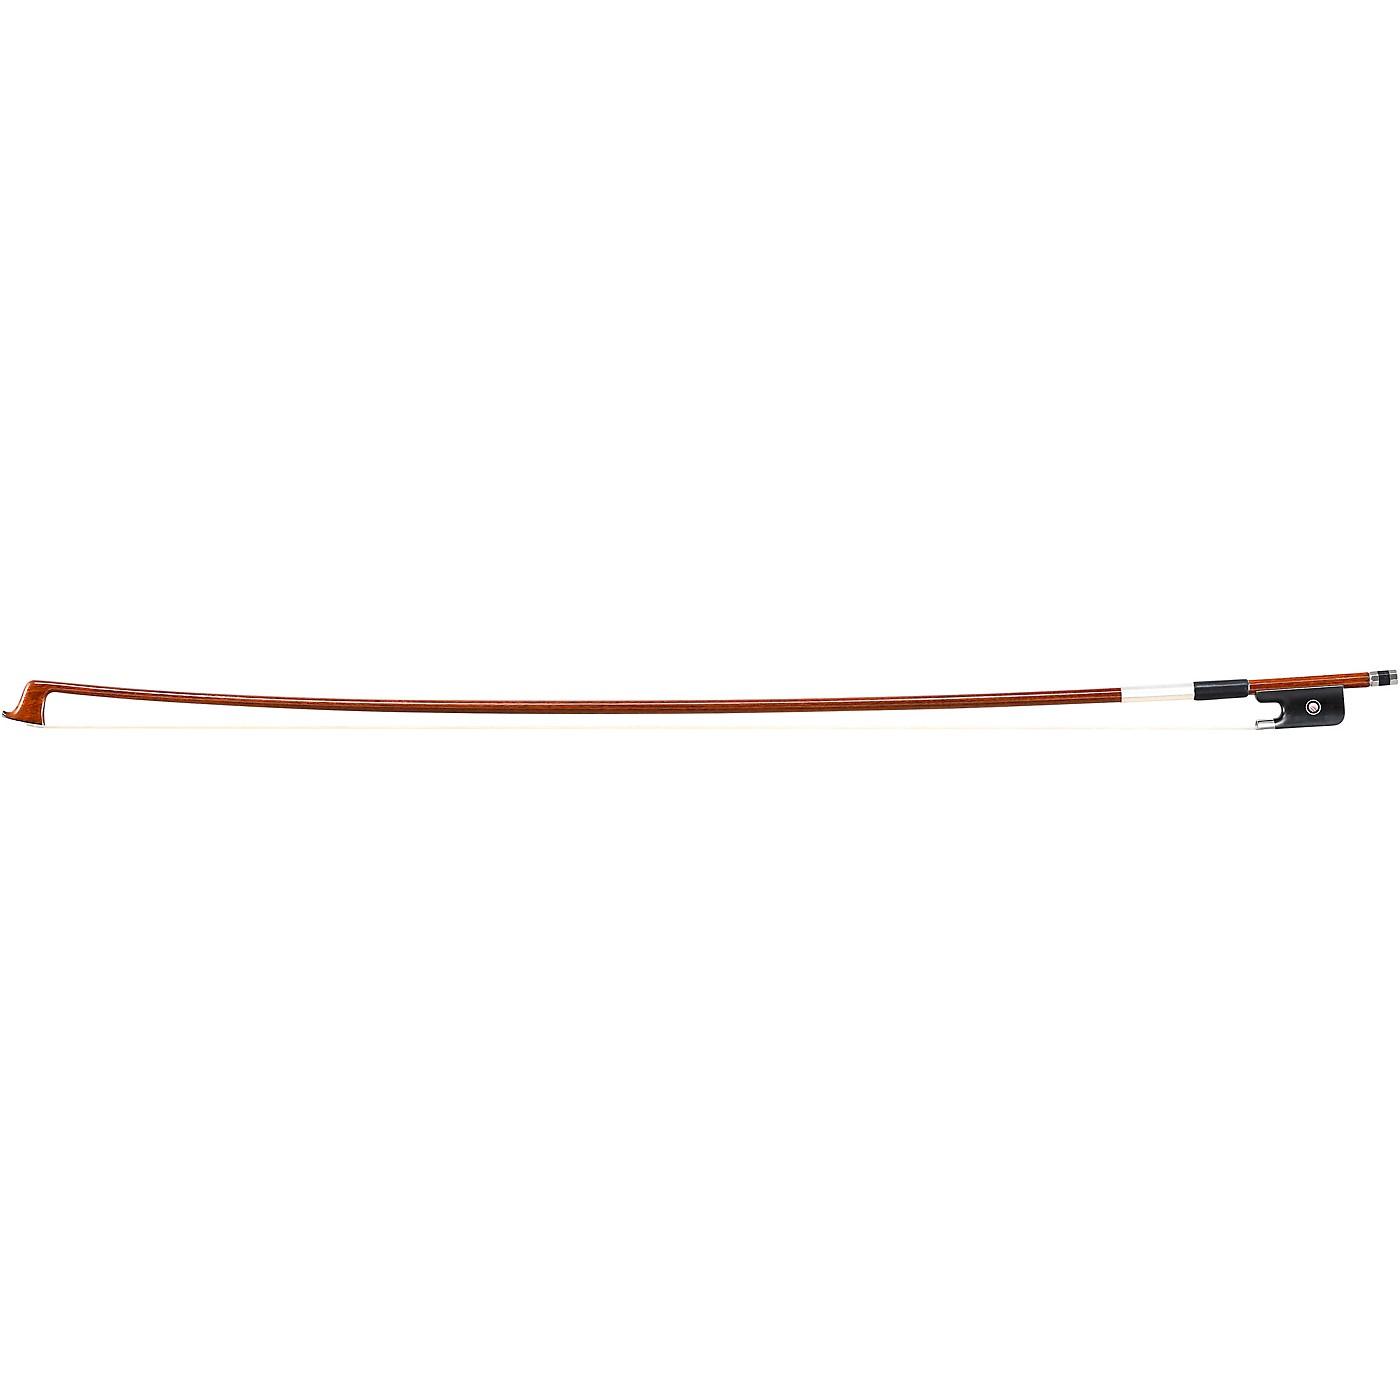 Artino Three Star Wood Veneer Carbon Fiber Viola Bow thumbnail